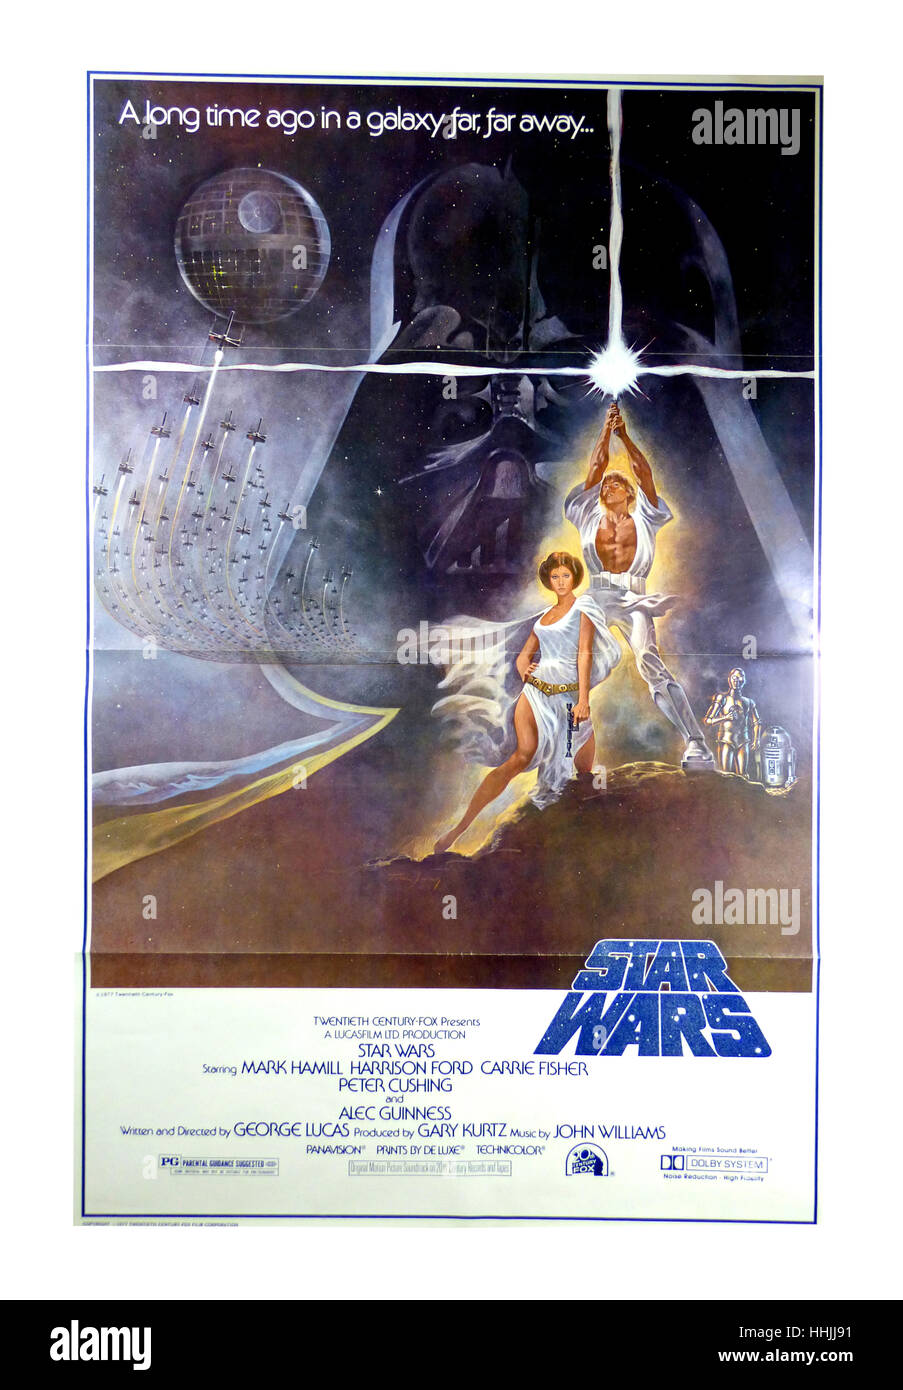 Star Wars Original Film Movie Poster 1977 - Stock Image